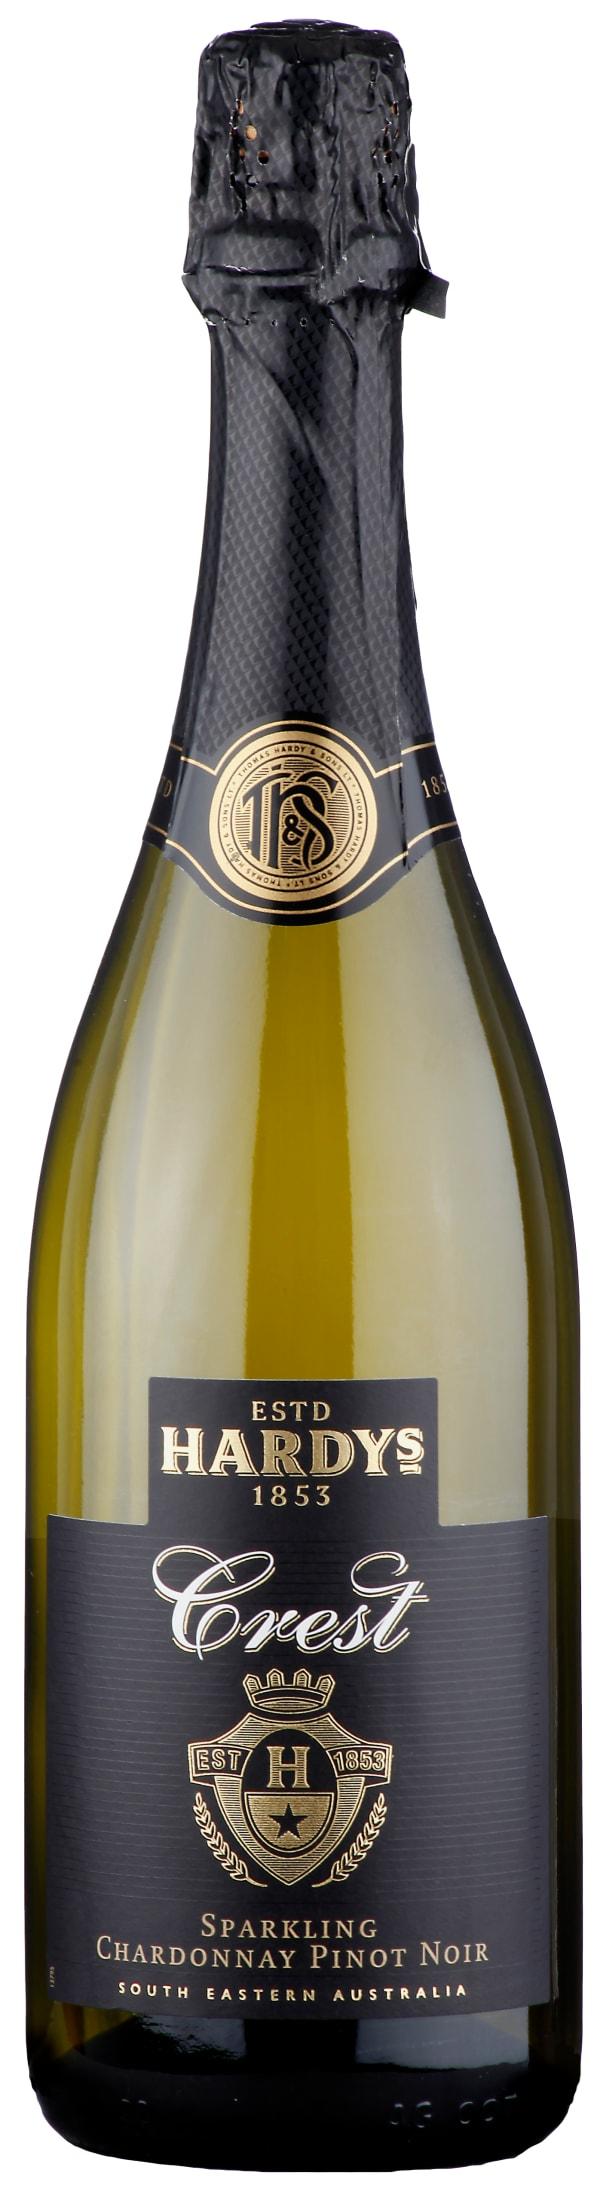 Hardys Crest Sparkling Chardonnay Pinot Noir Brut